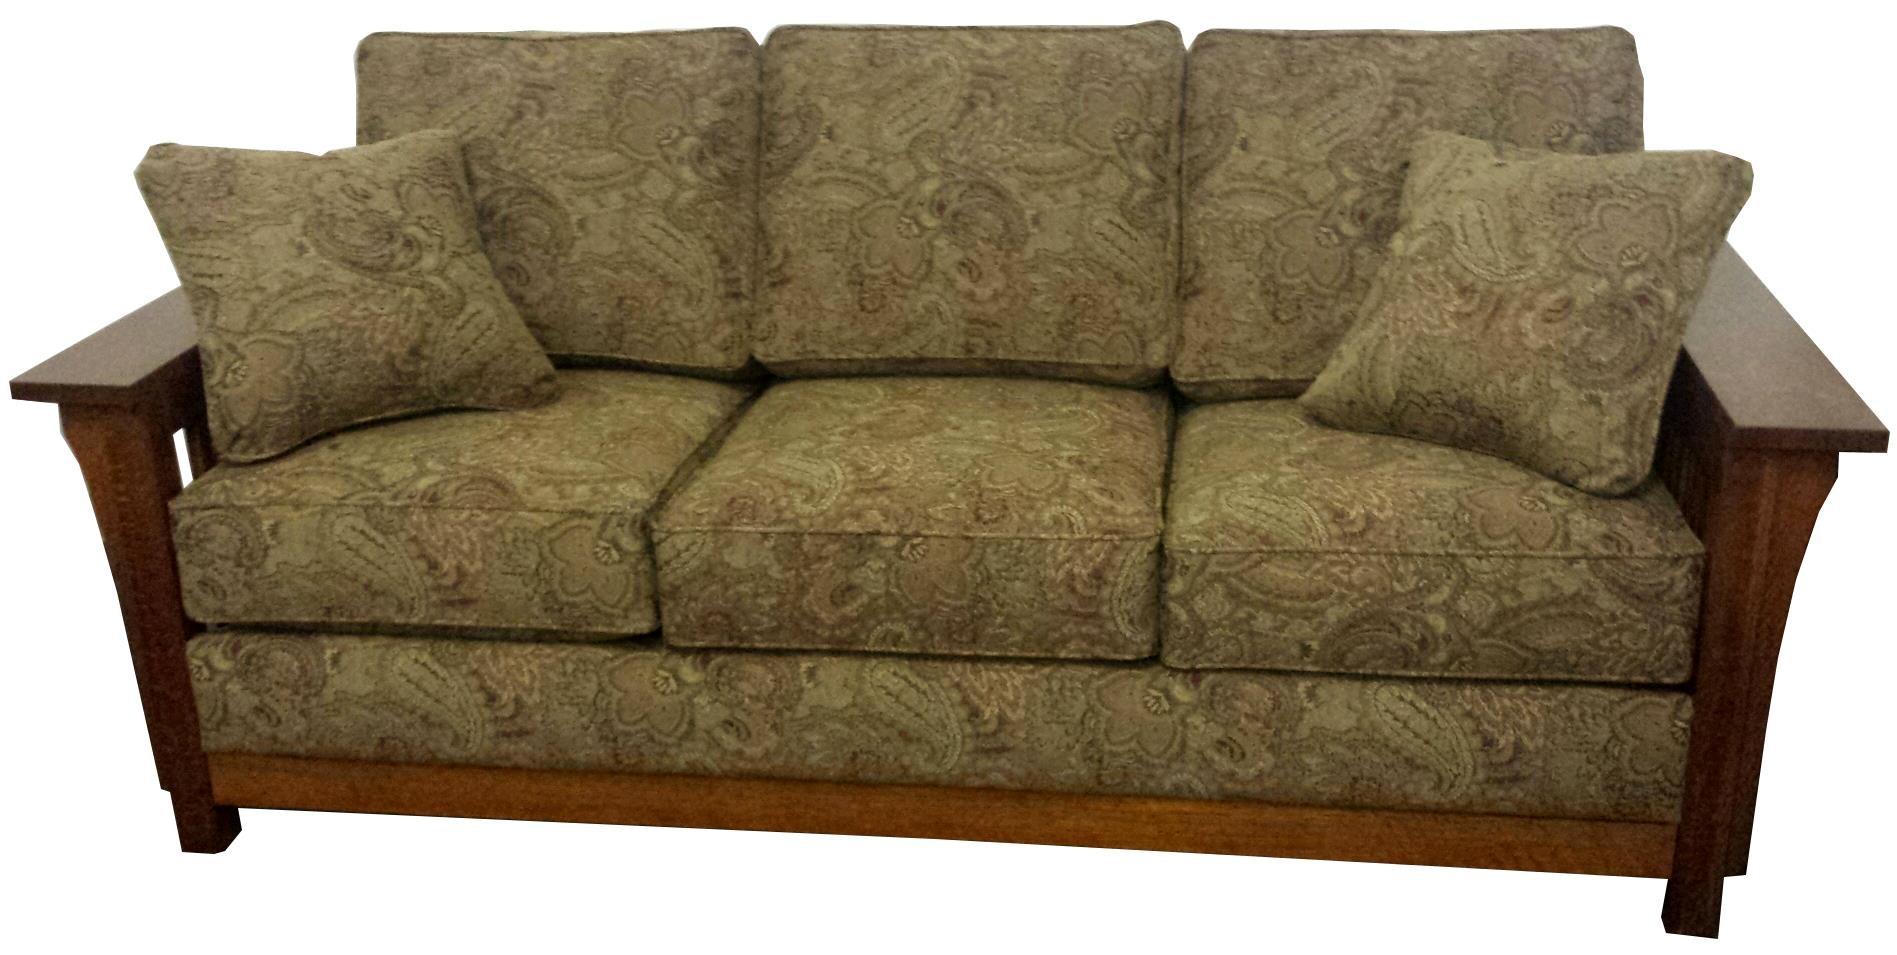 Borkholder Furniture Bungalow Sofa   Standard Fabric 13 2302STD